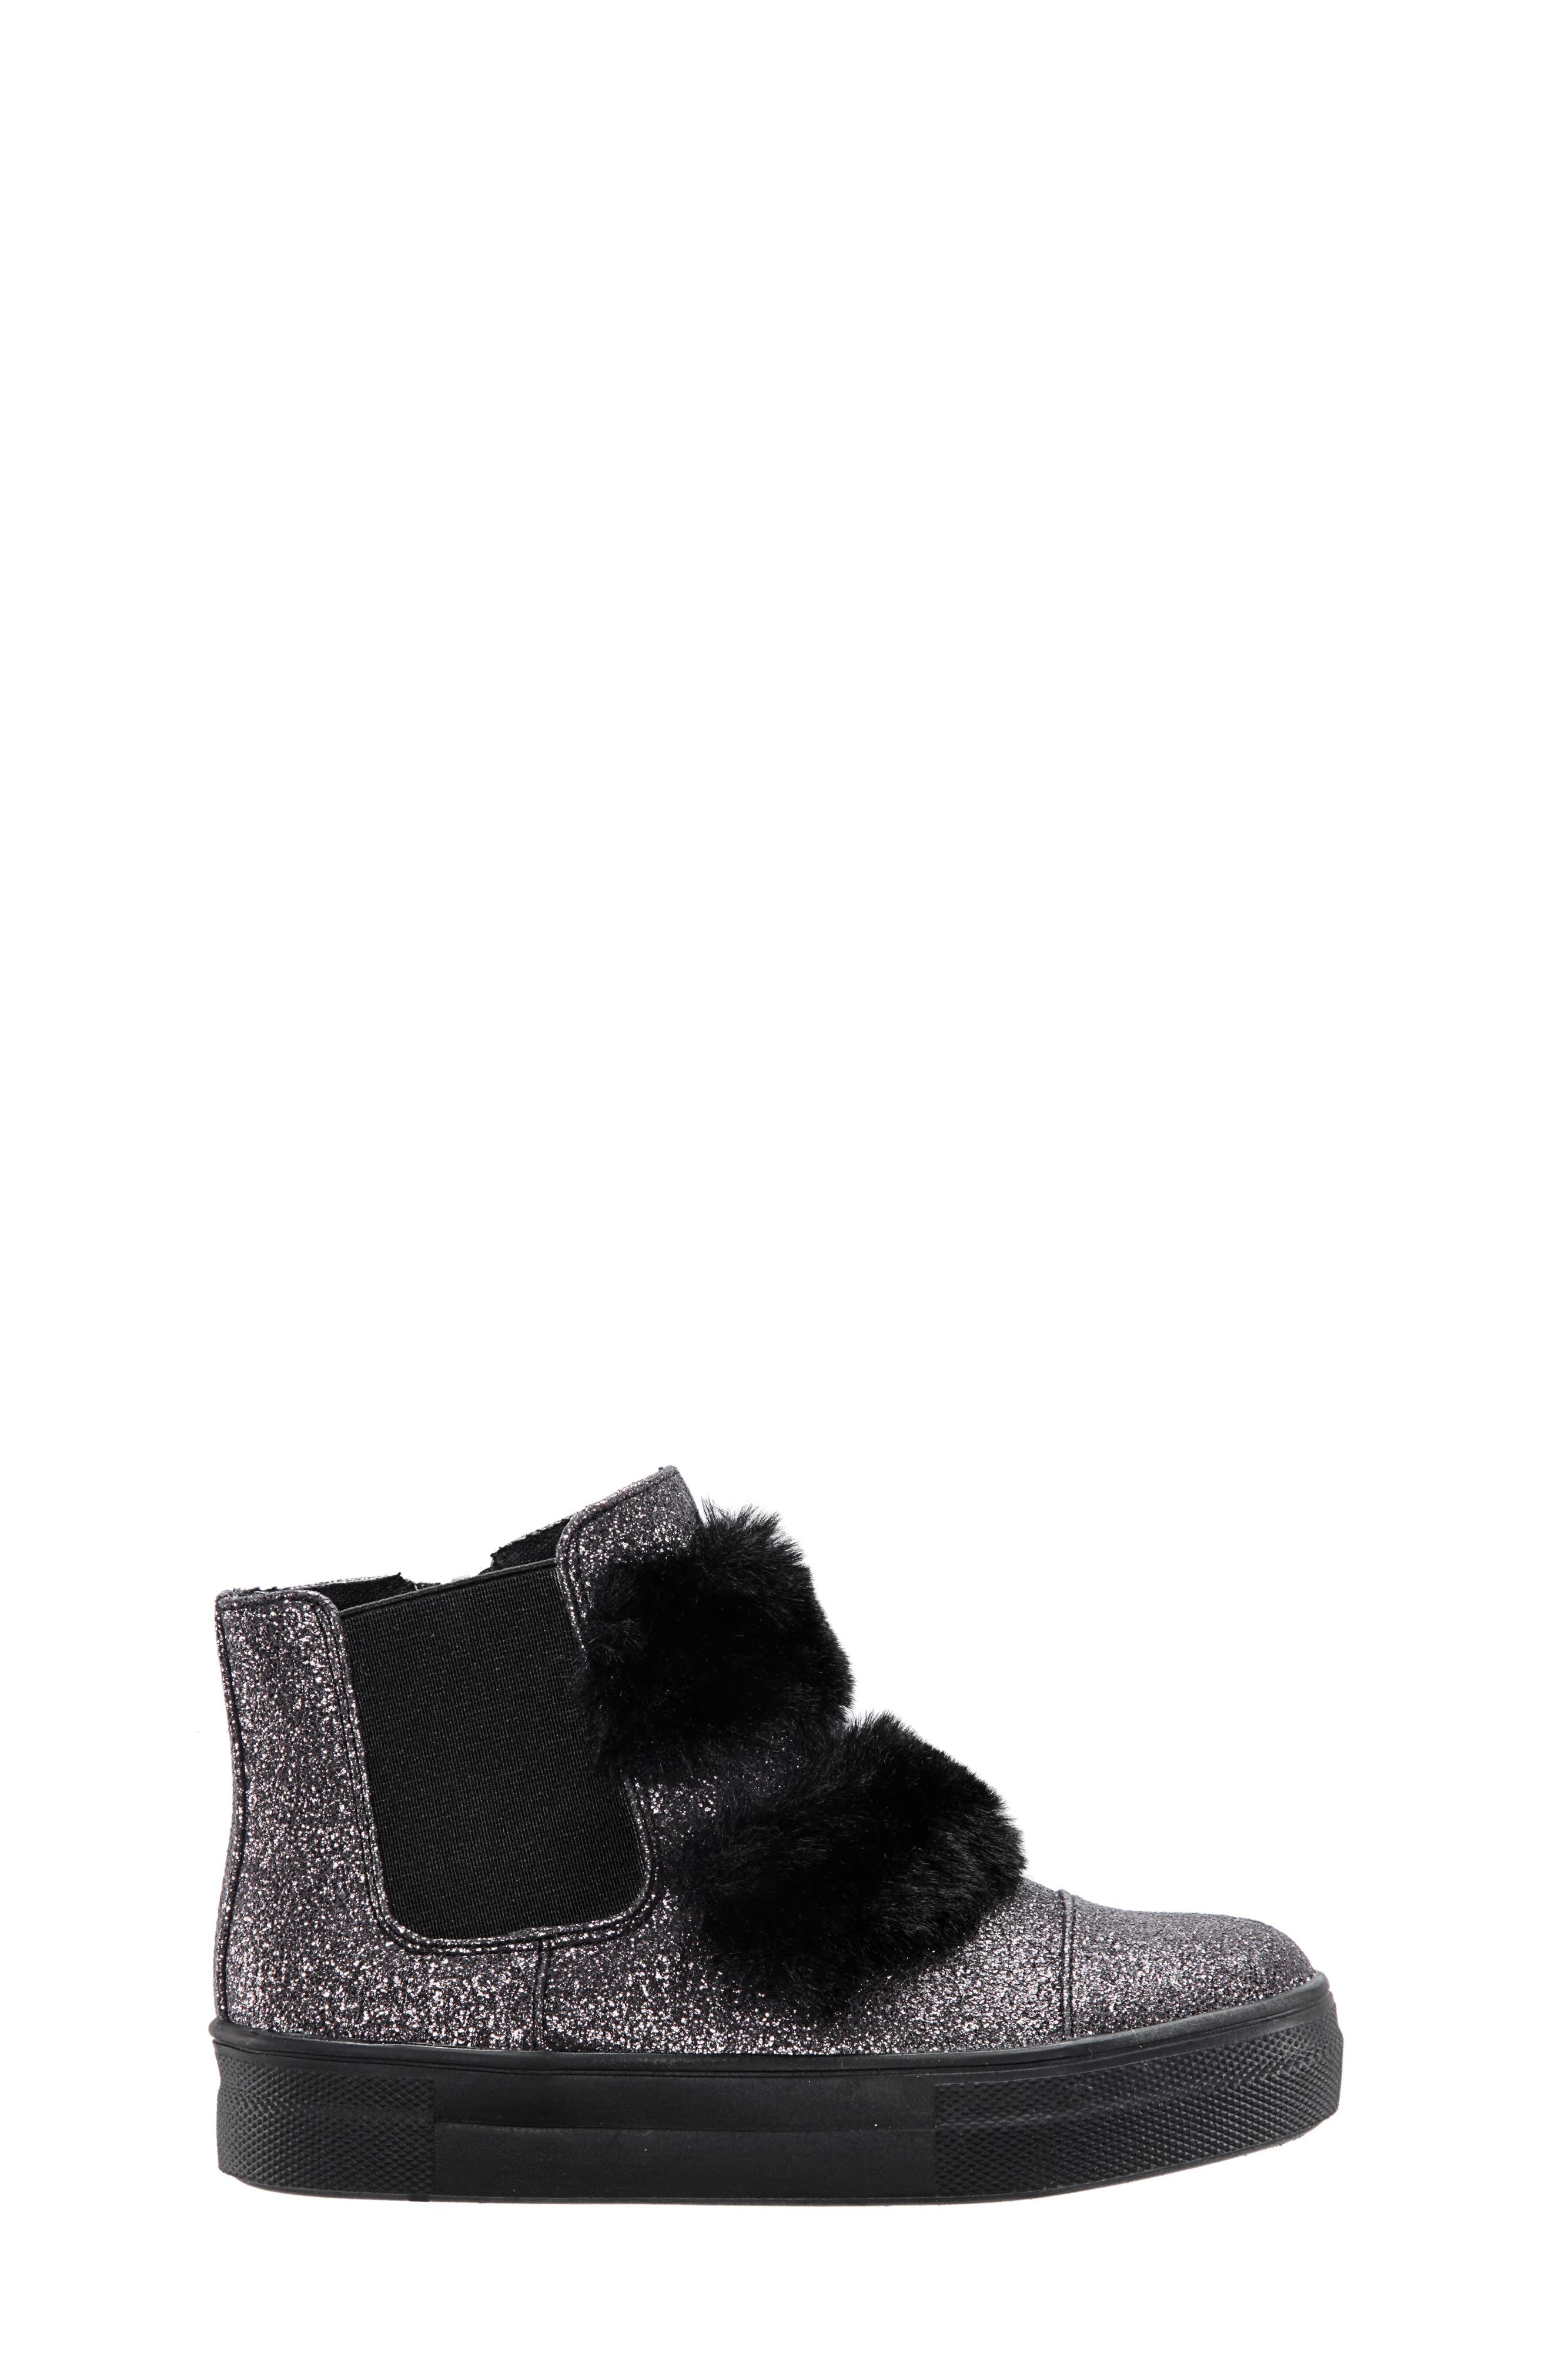 Helen Faux Fur Bootie Sneaker,                             Alternate thumbnail 3, color,                             PEWTER CRACKLE METALLIC